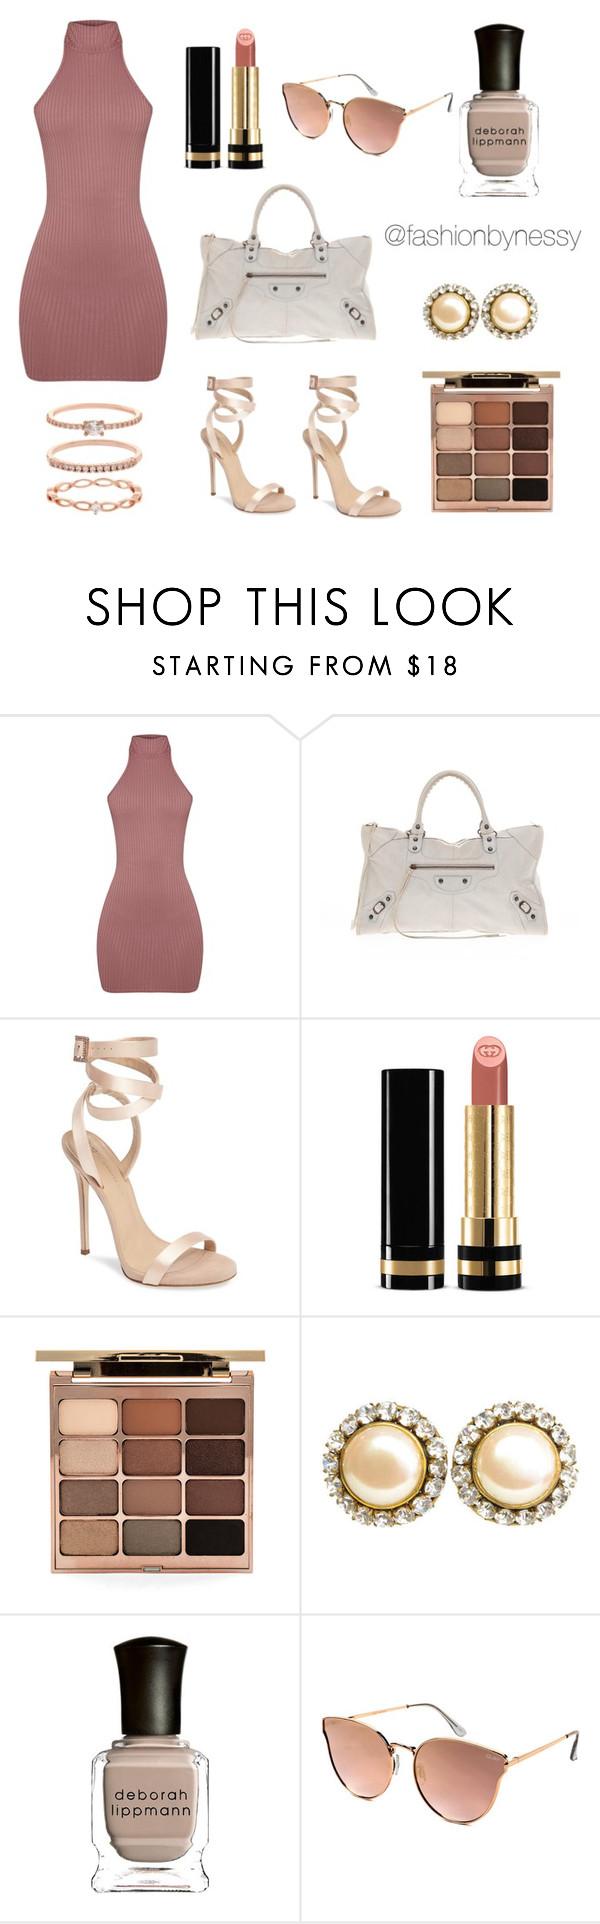 """Pink Mauve Dress Set"" by nessyramirez ❤ liked on Polyvore featuring Balenciaga, Giuseppe Zanotti, Gucci, Stila, Chanel, Deborah Lippmann, Quay and Accessorize"